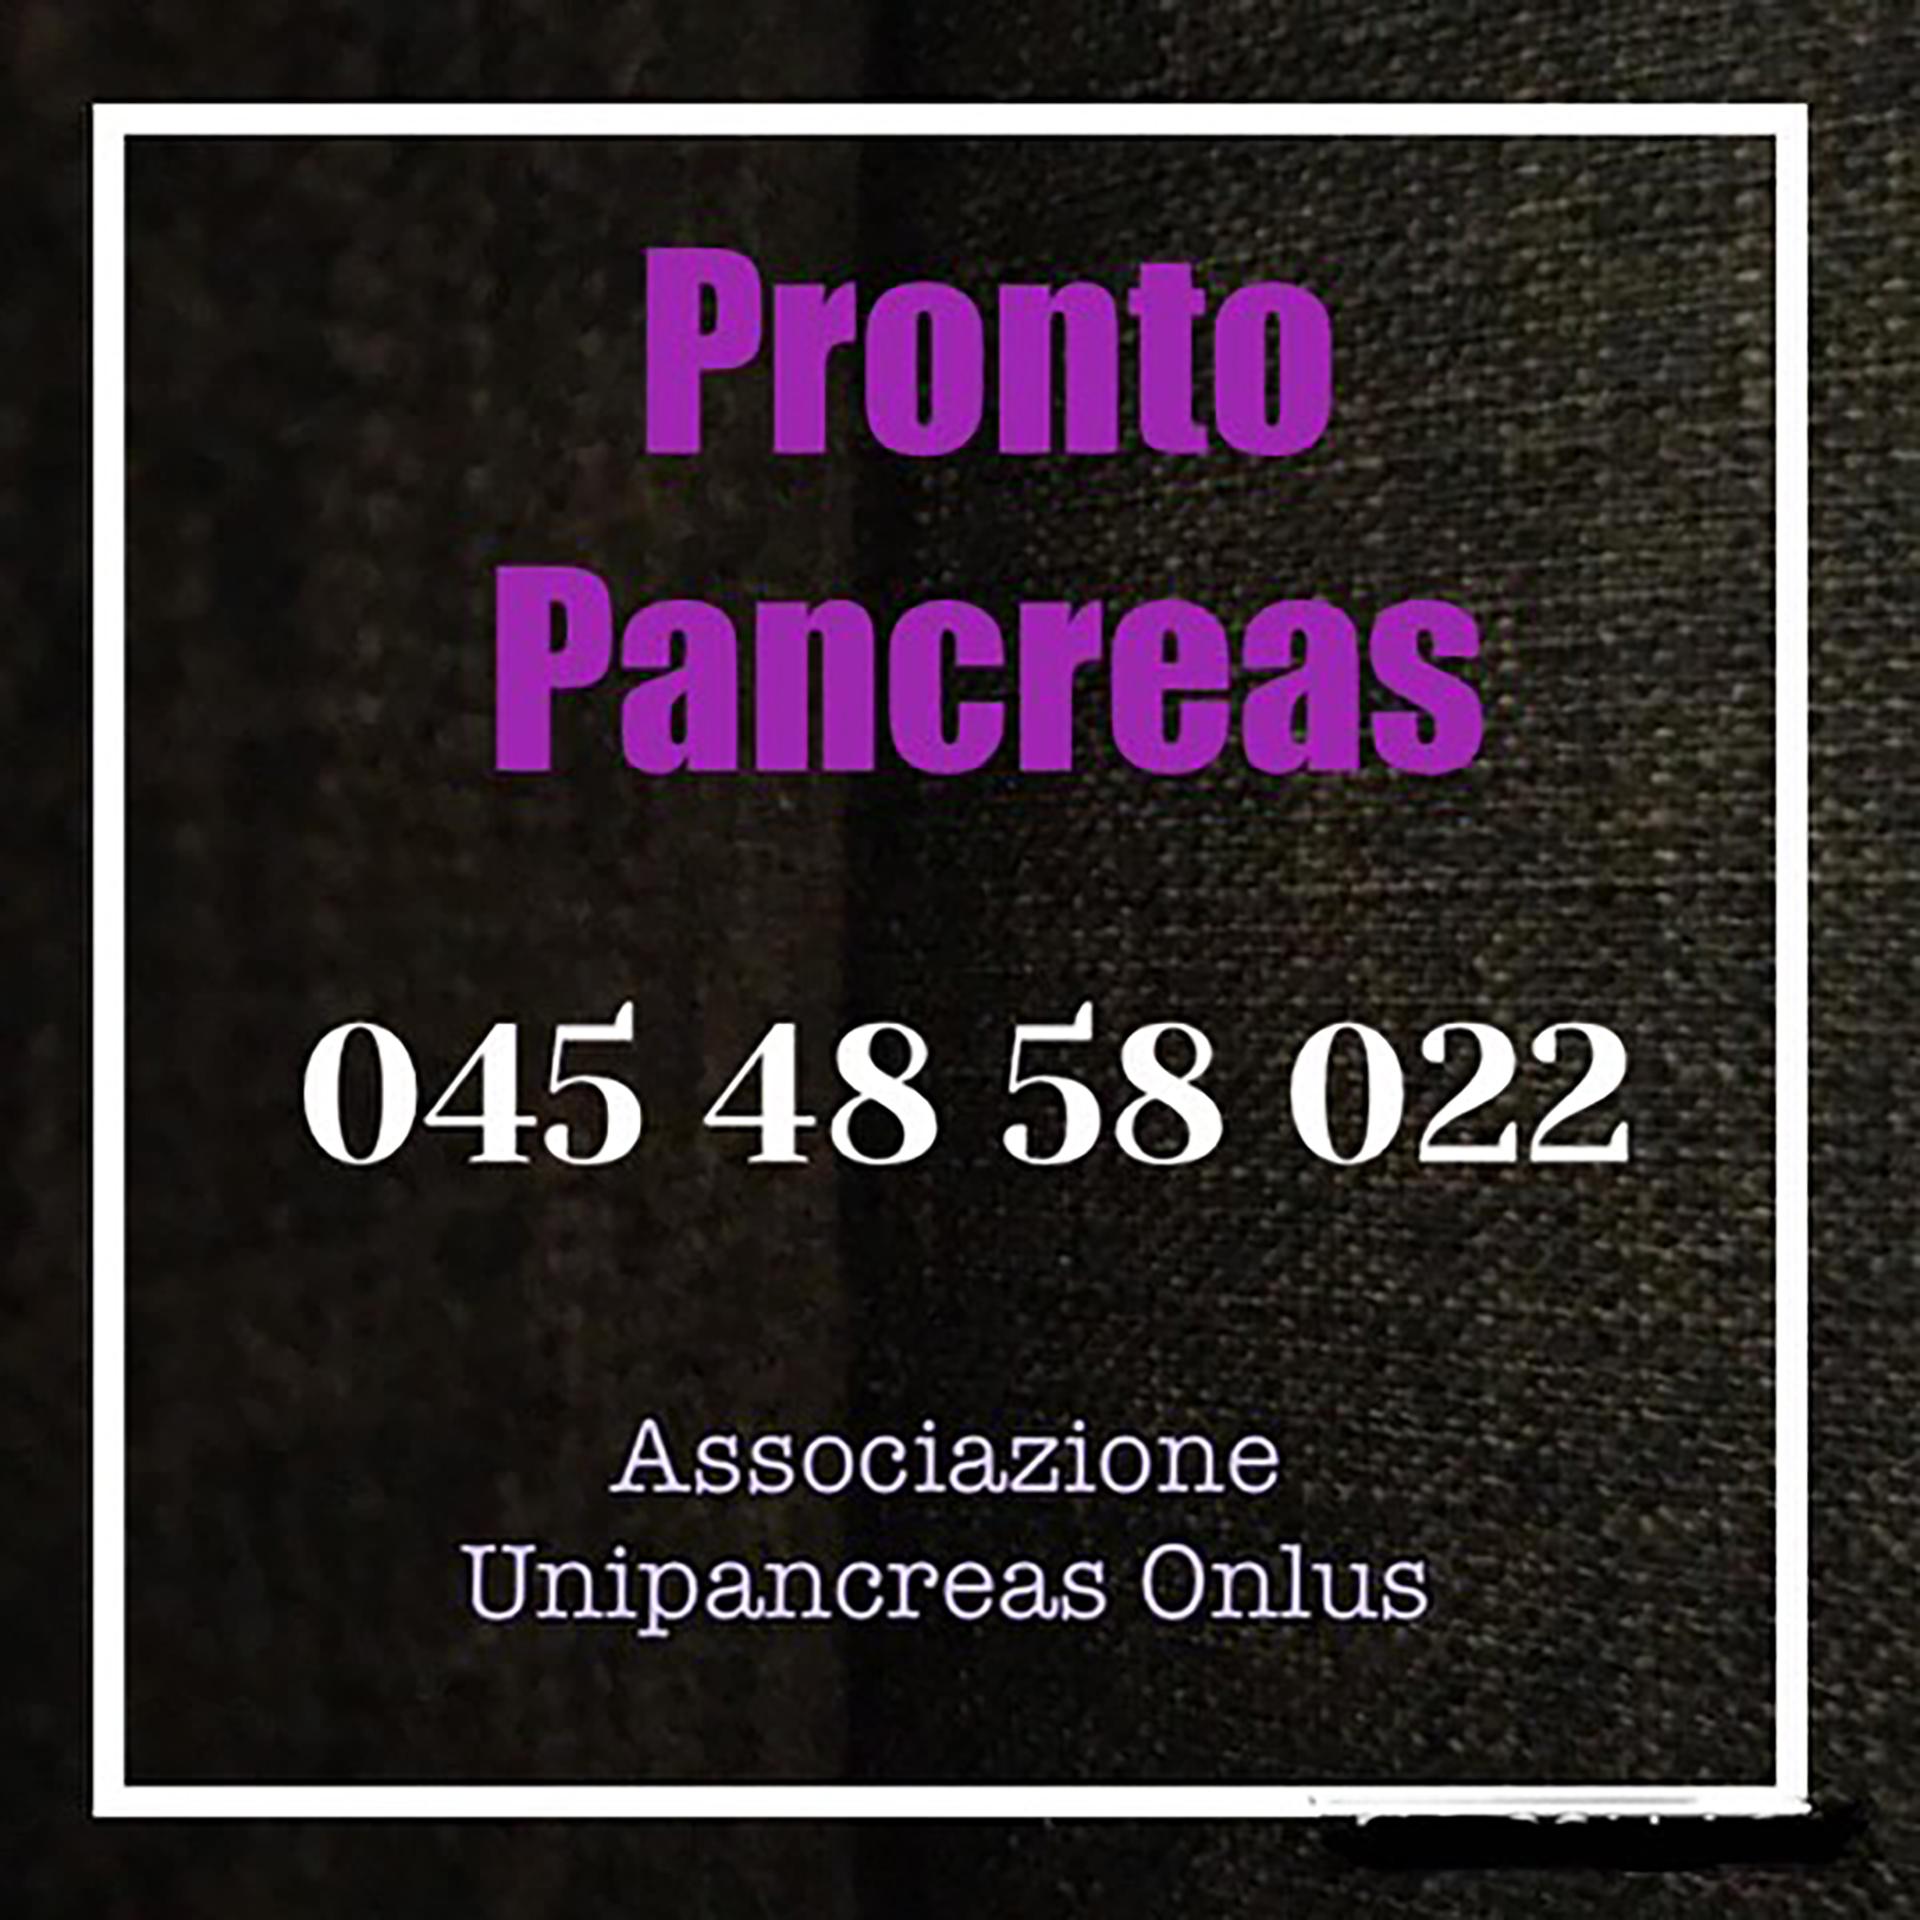 PRONTO PANCREAS